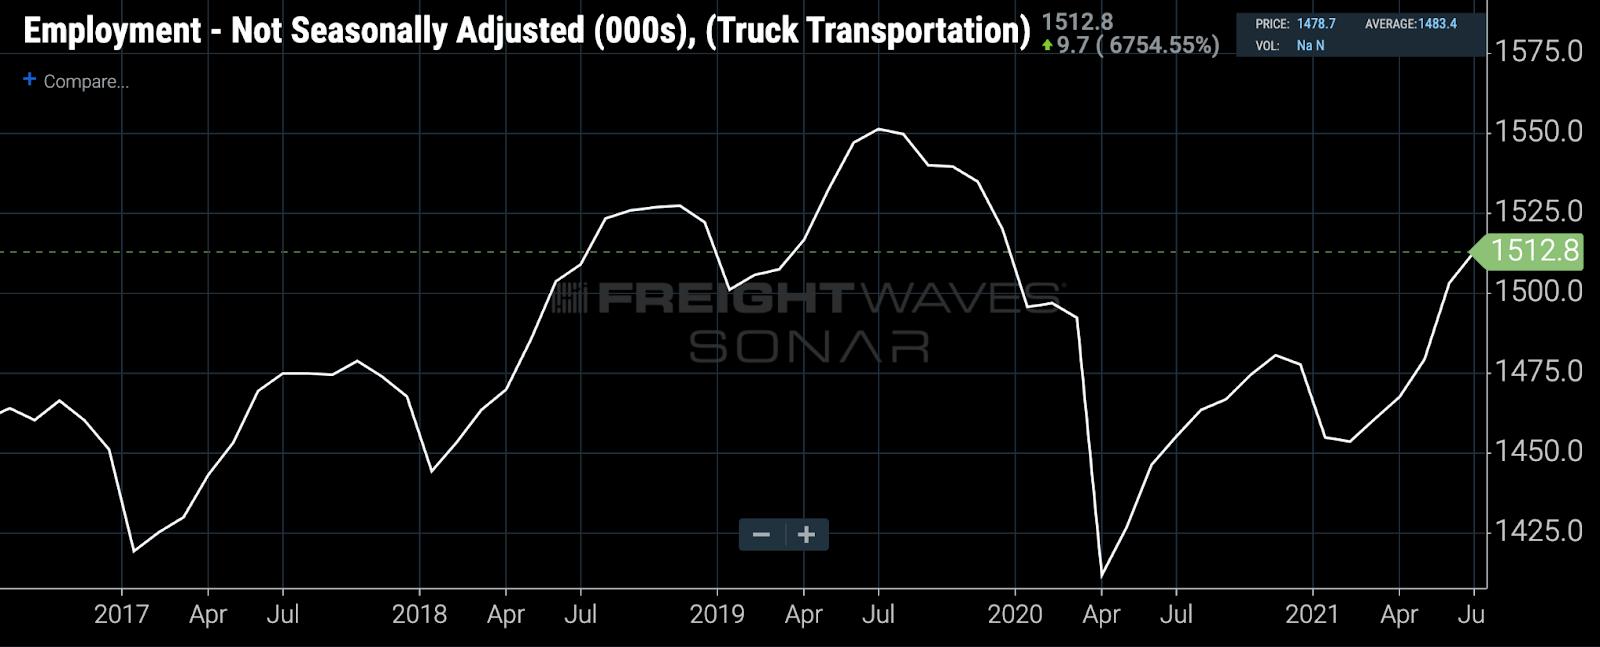 Employment - Not Seasonally Adjusted - Truck Transportation